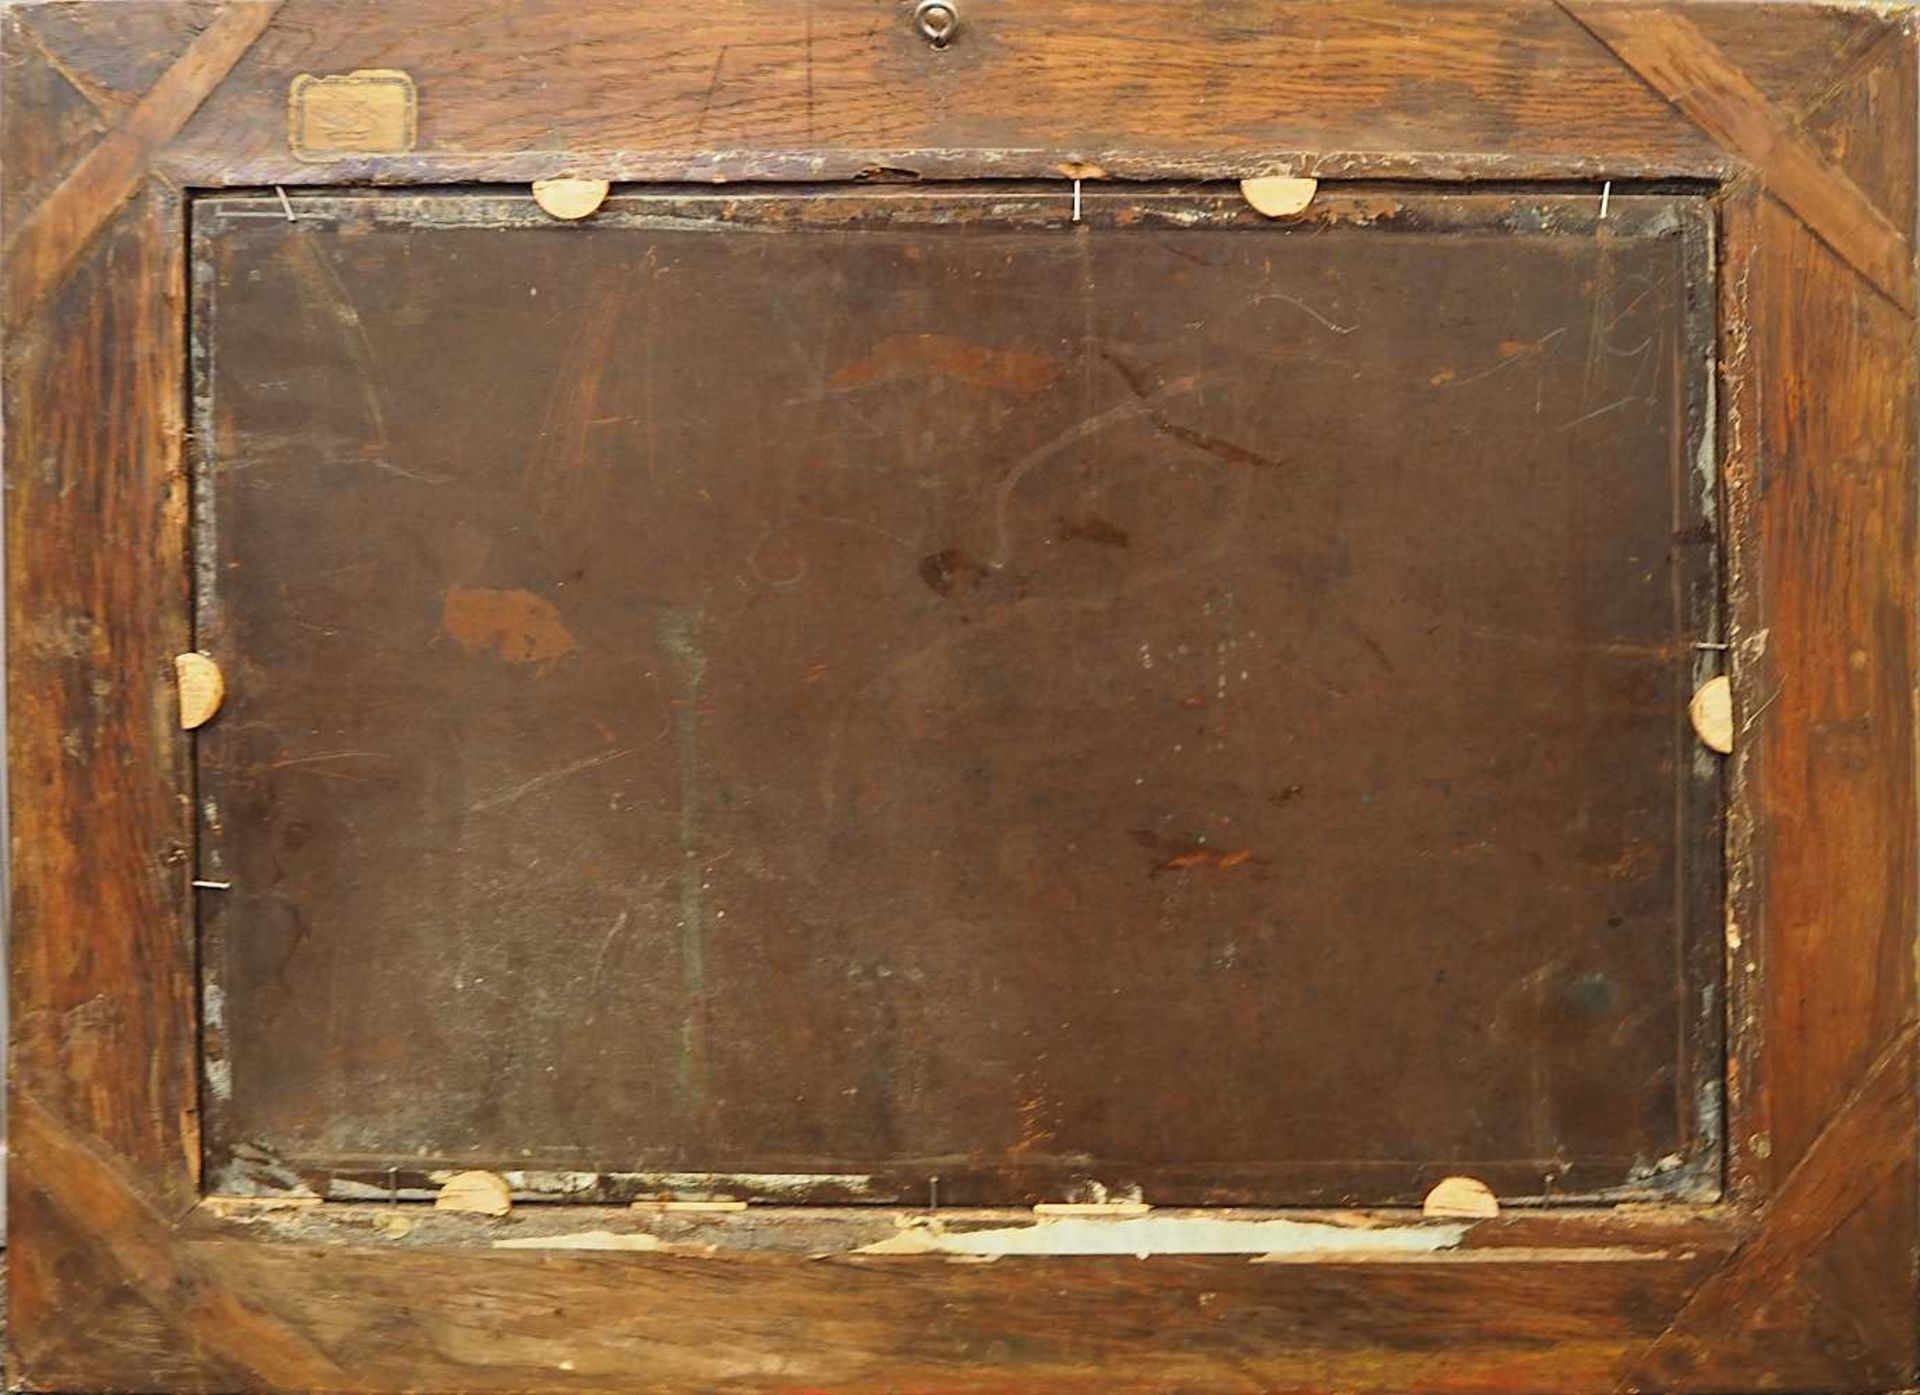 "1 Ölgemälde L.u. sign. P.J. PETIT (wohl Pierre-Joseph P. 1768-1825),""Musikabend im Freien"",</b - Bild 4 aus 4"